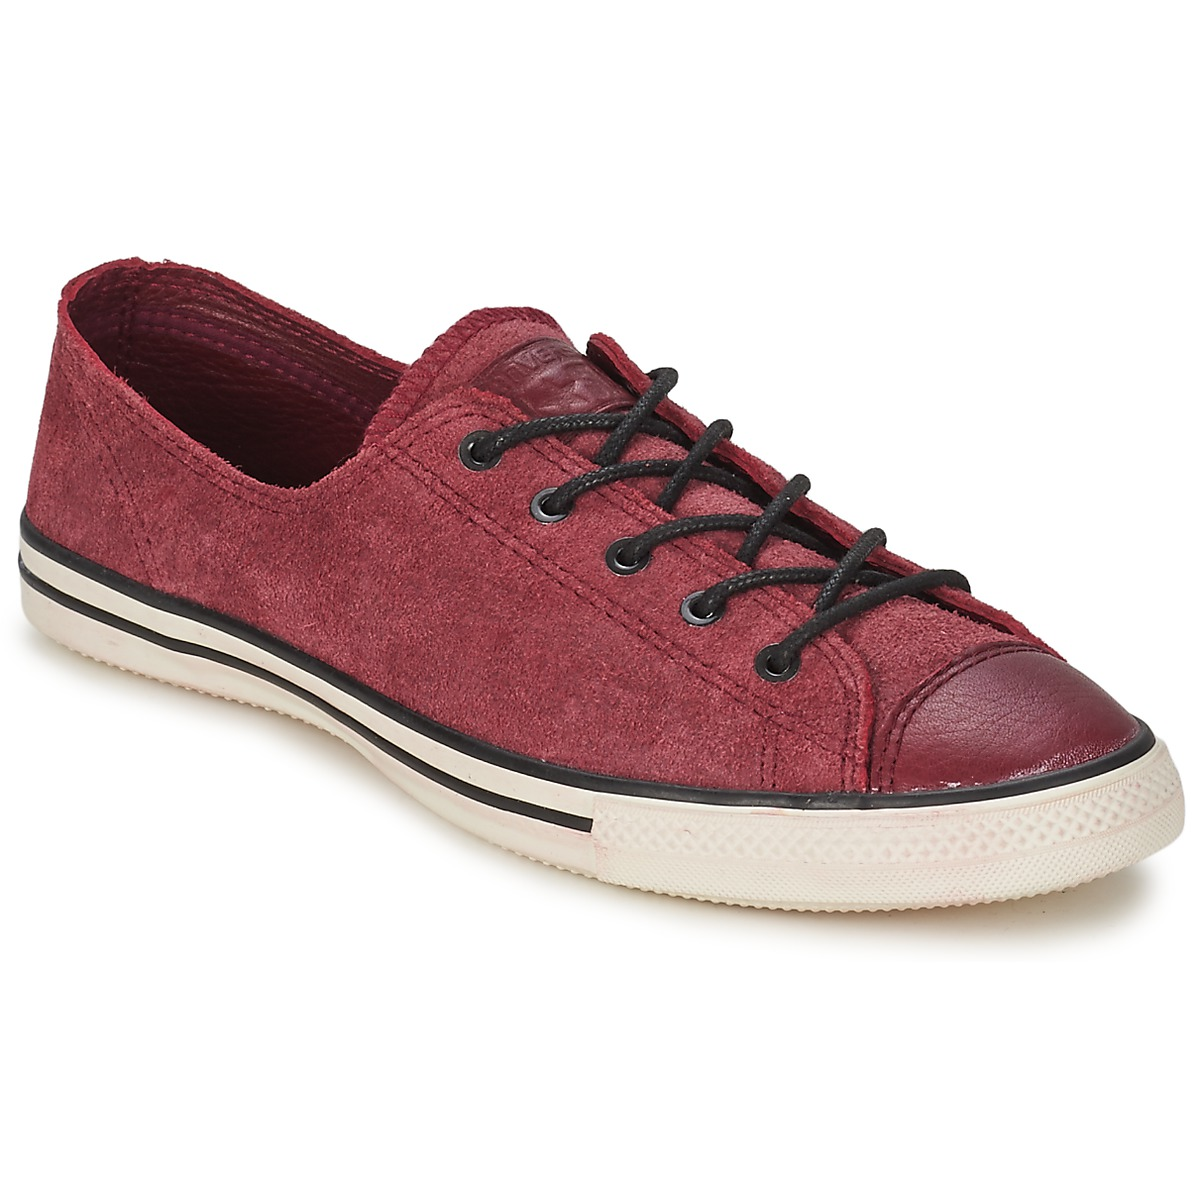 0d297203a277 Converse ALL STAR FANCY LEATHER OX BORDEAUX Shoes Low top trainers Women  best